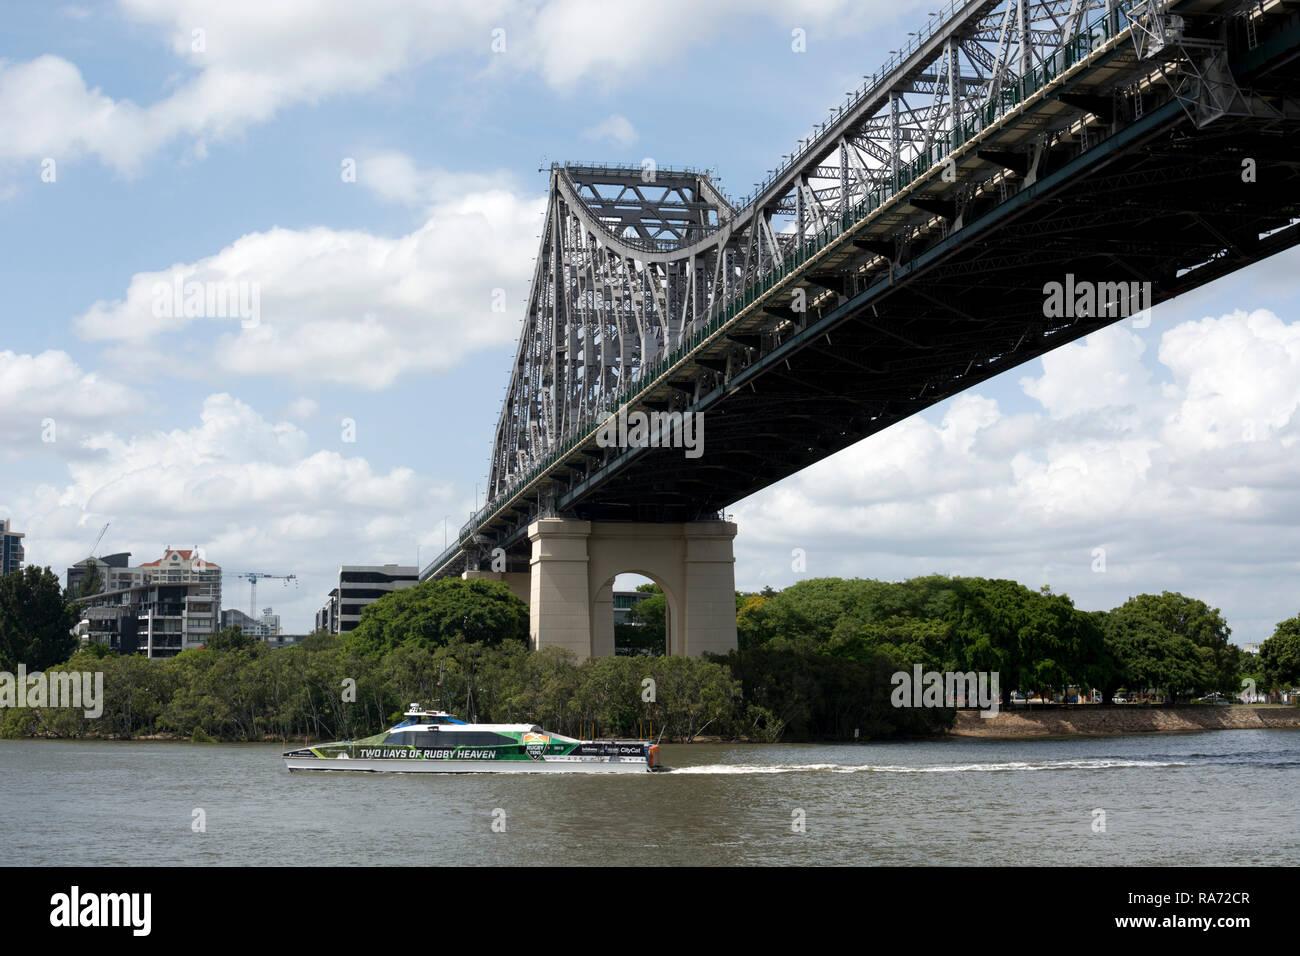 Story Bridge and CityCat ferry, Brisbane, Queensland, Australia - Stock Image